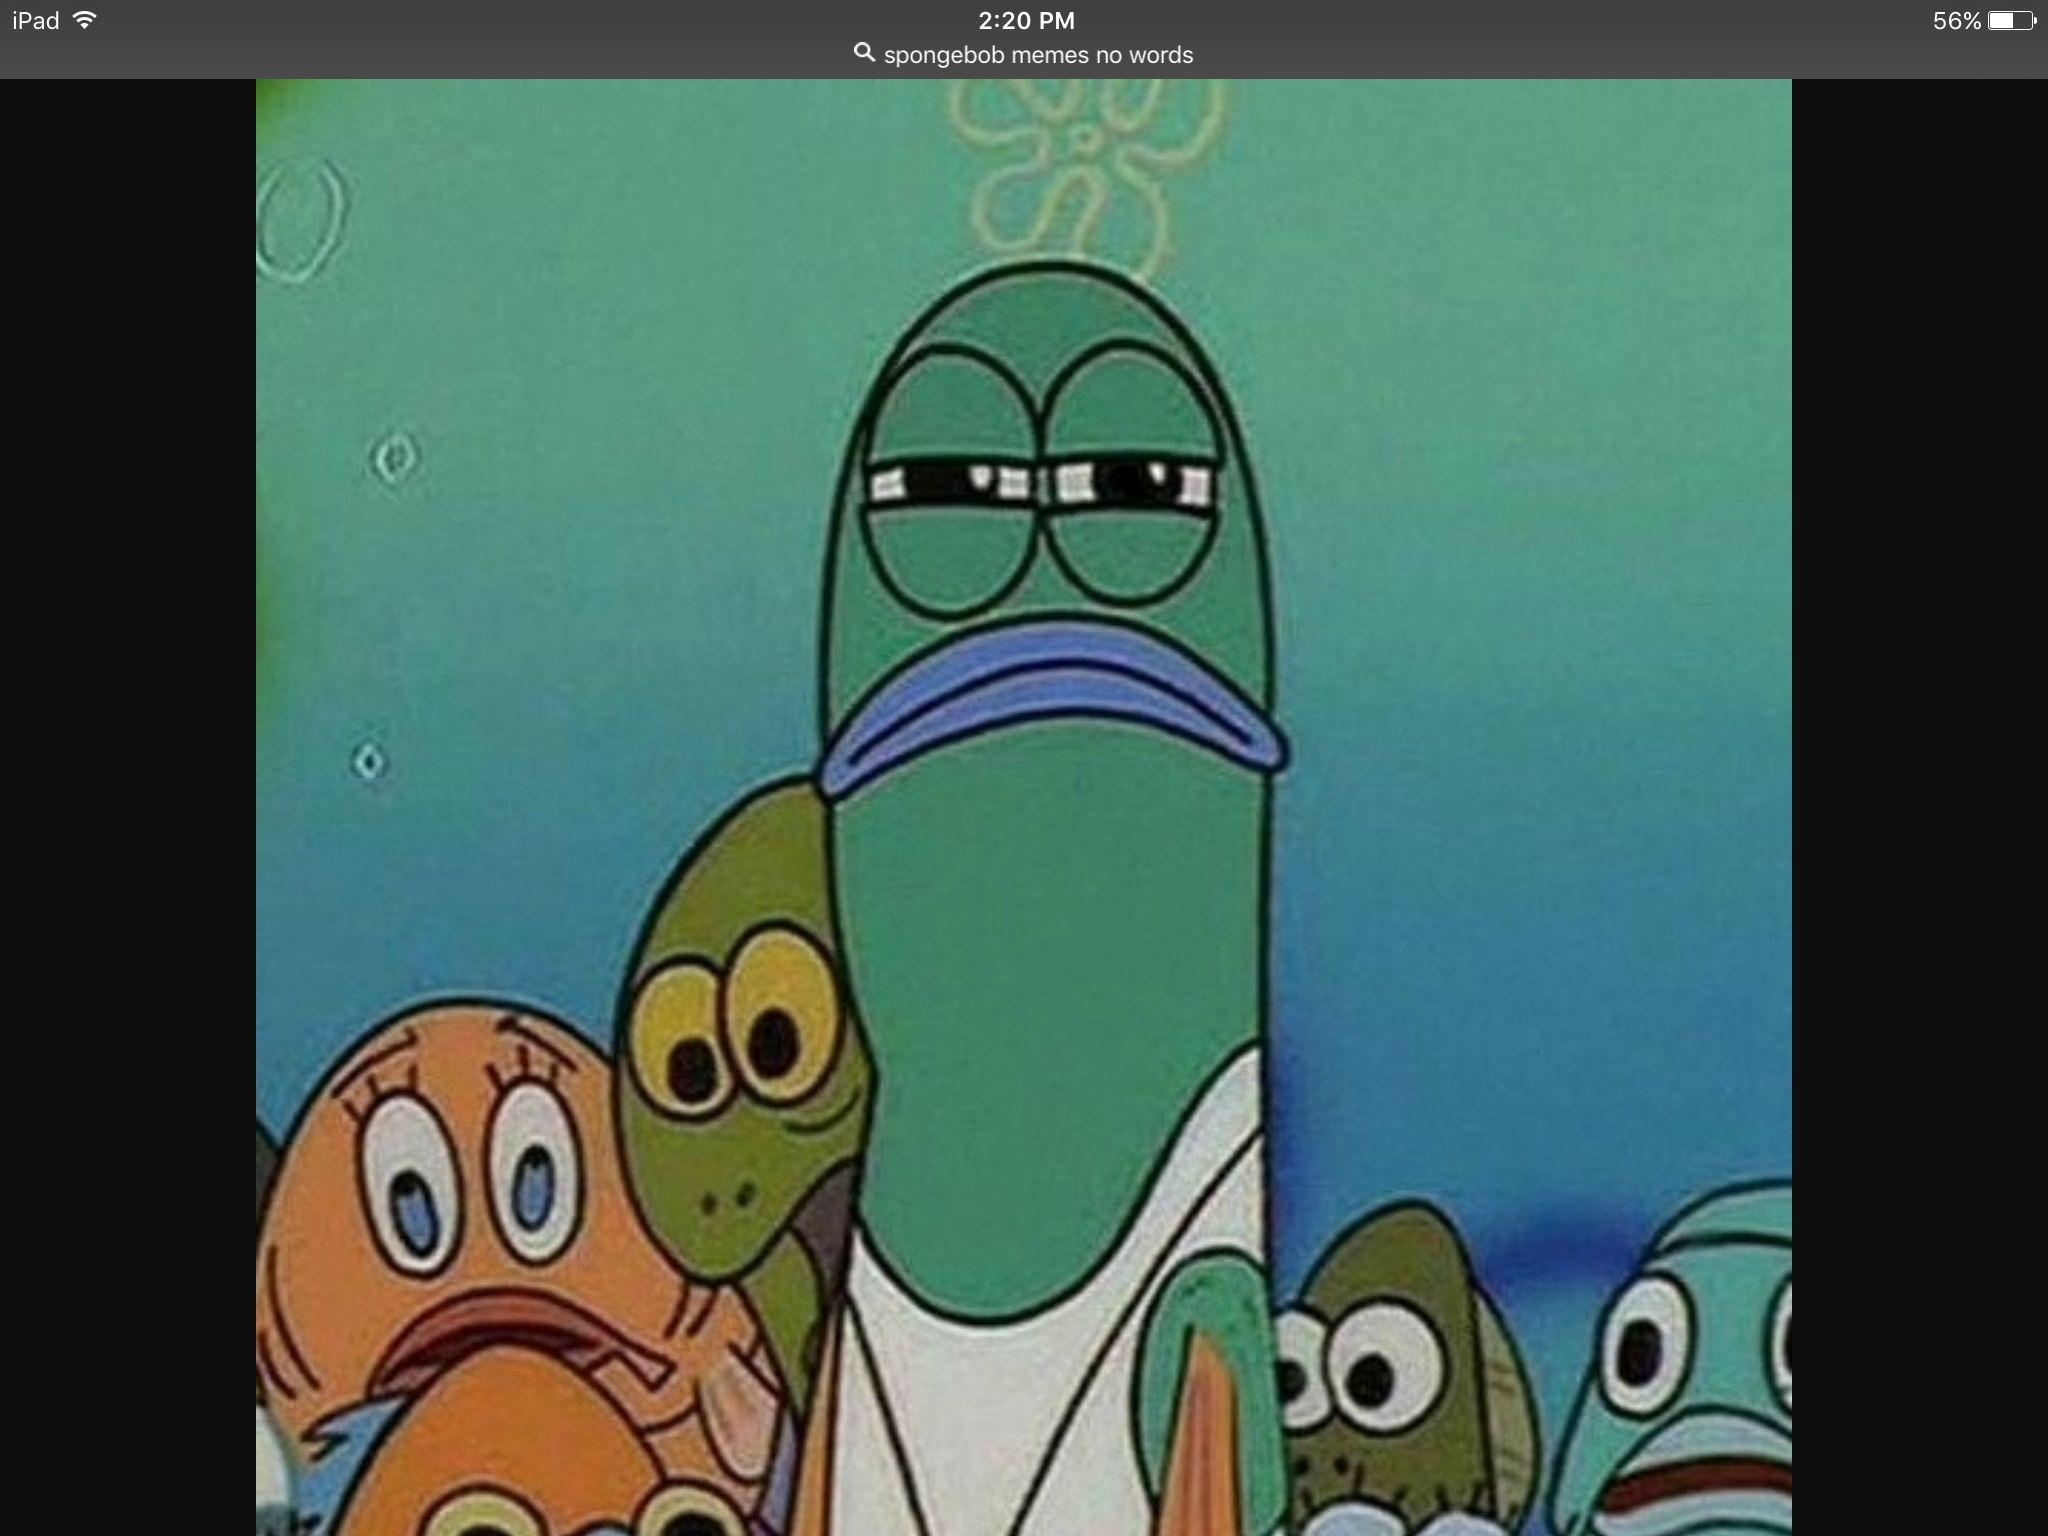 blank-meme-template-spongebob-disappointed-green-fish ...